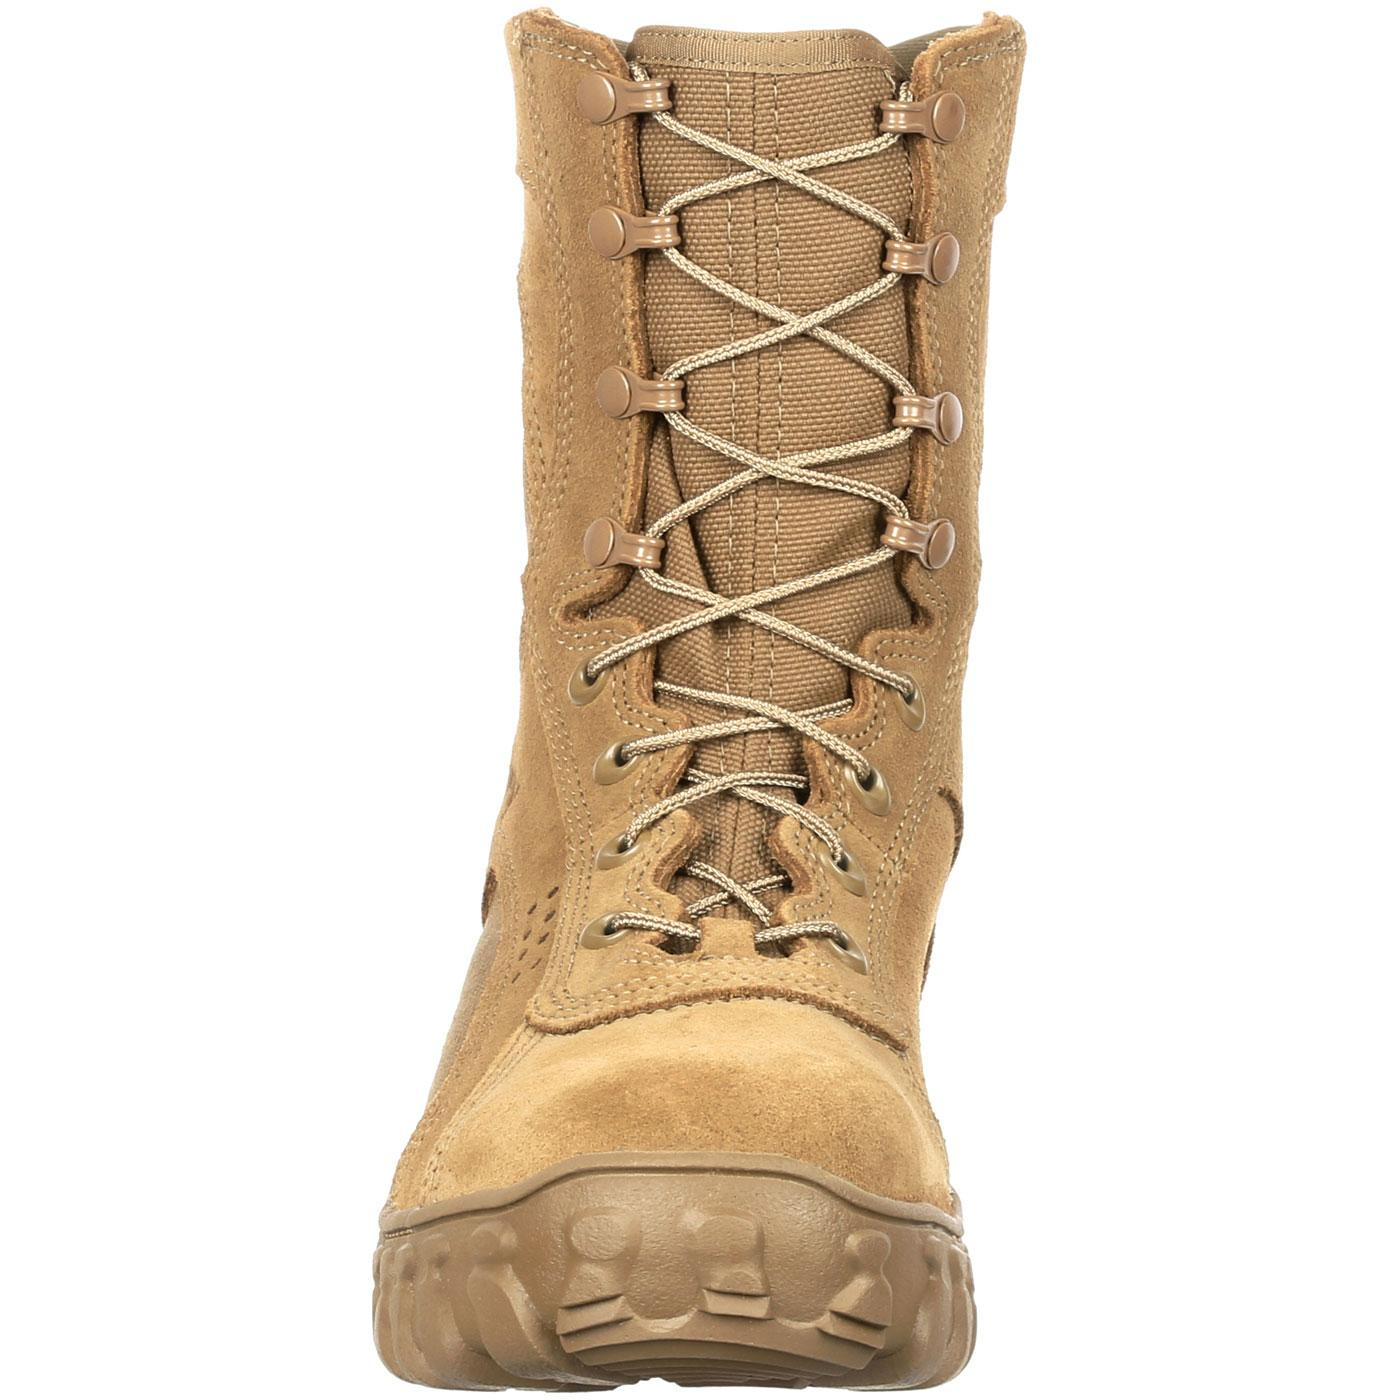 b45b9058e3a Rocky S2V Steel Toe Tactical Military Boot